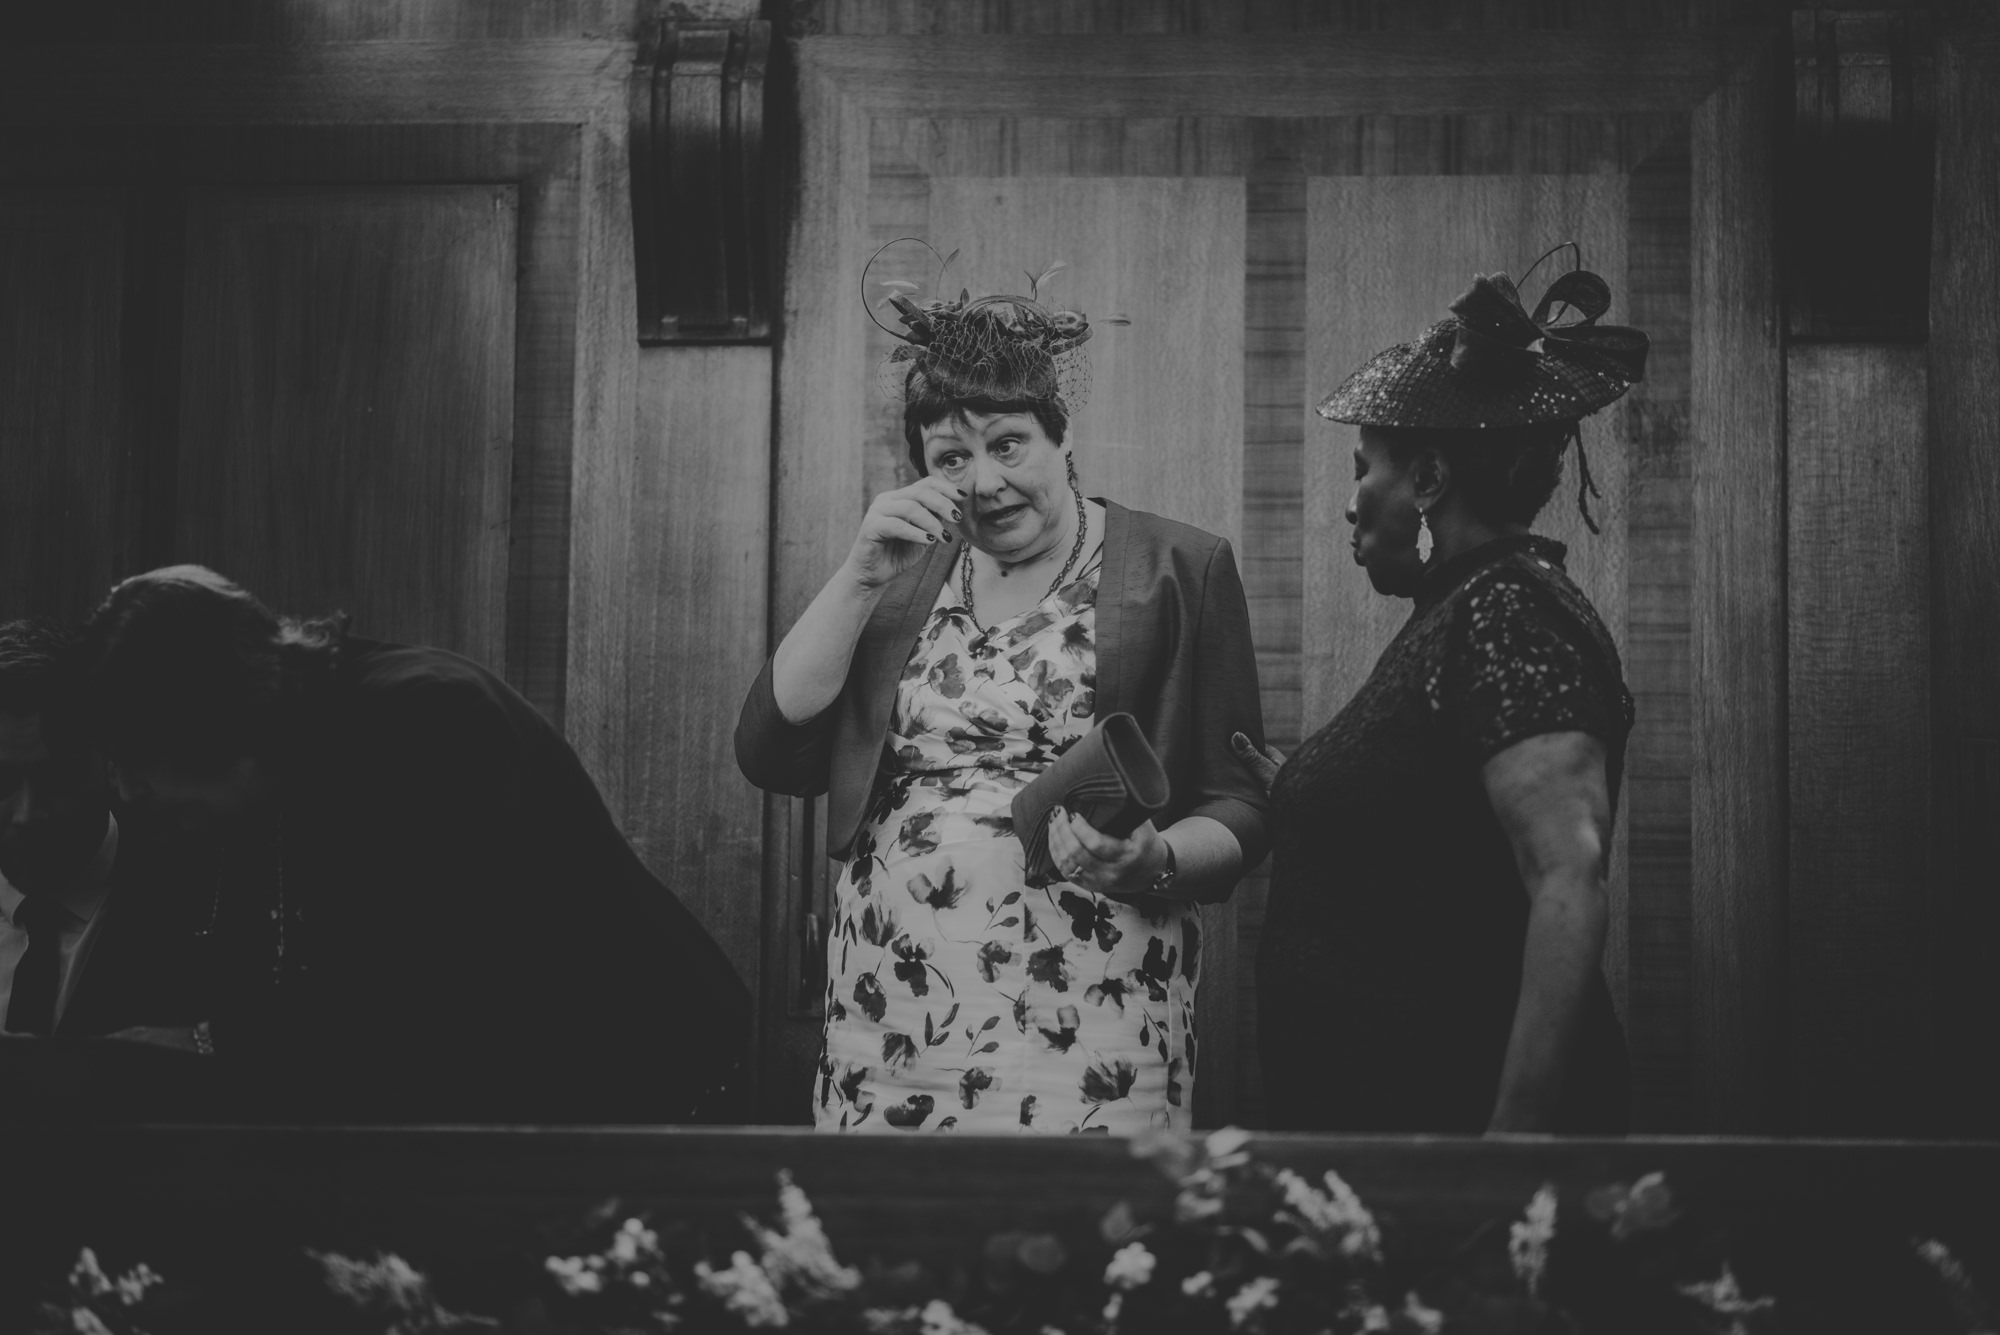 Jacqueline-Gareth-Wedding-Westmead-Events-Surrey-Manu-Mendoza-Wedding-Photography-059.jpg